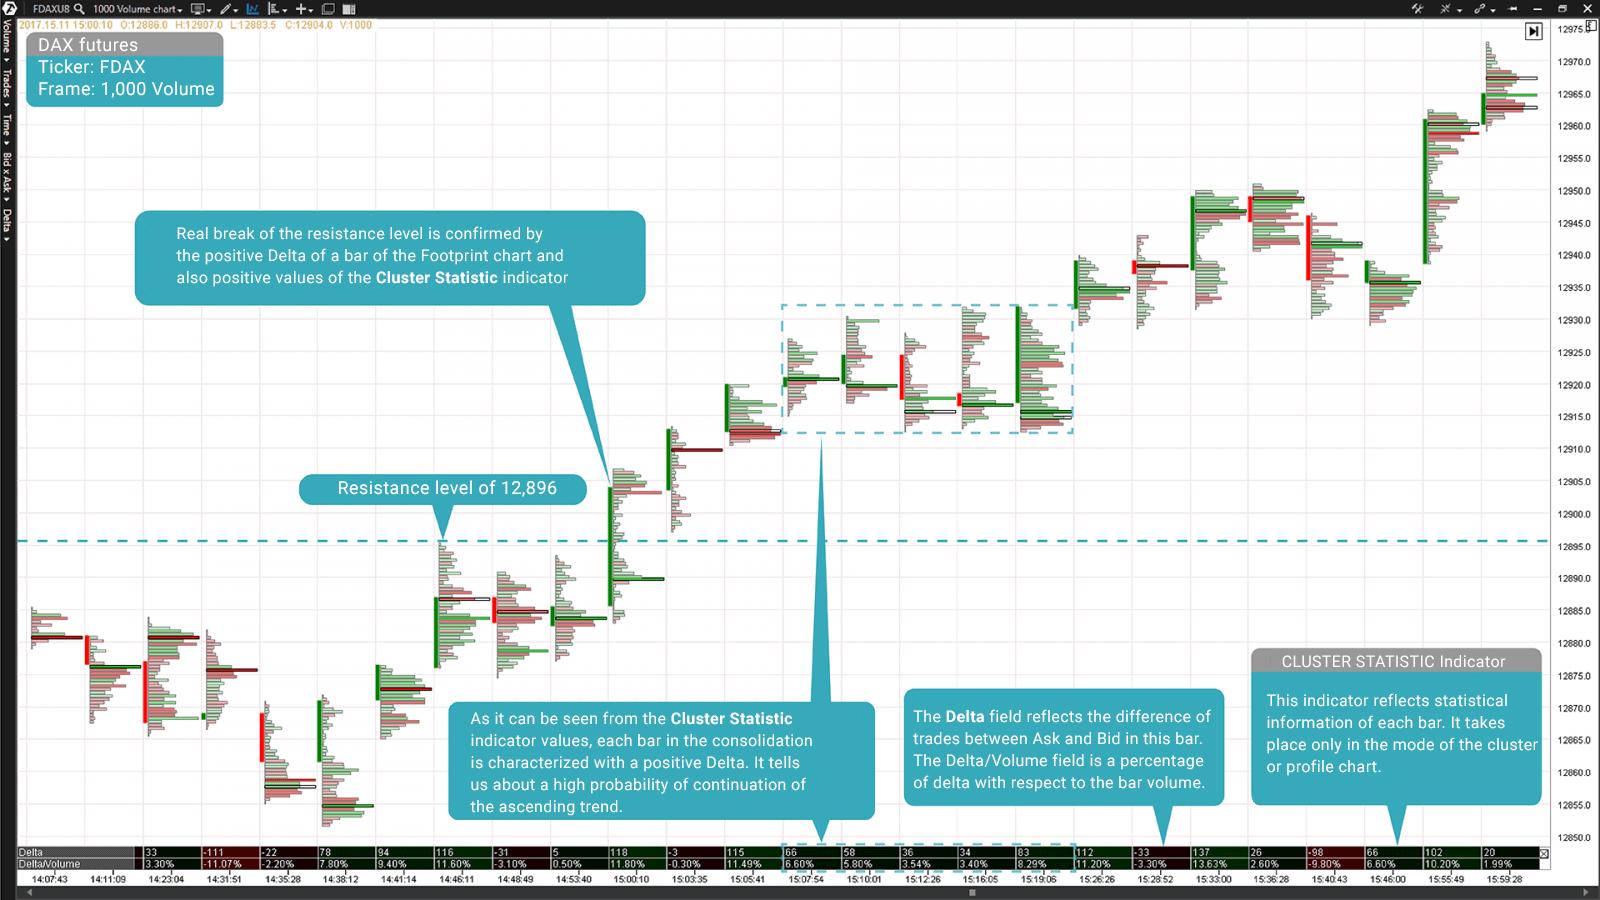 Footprint of a DAX Index futures